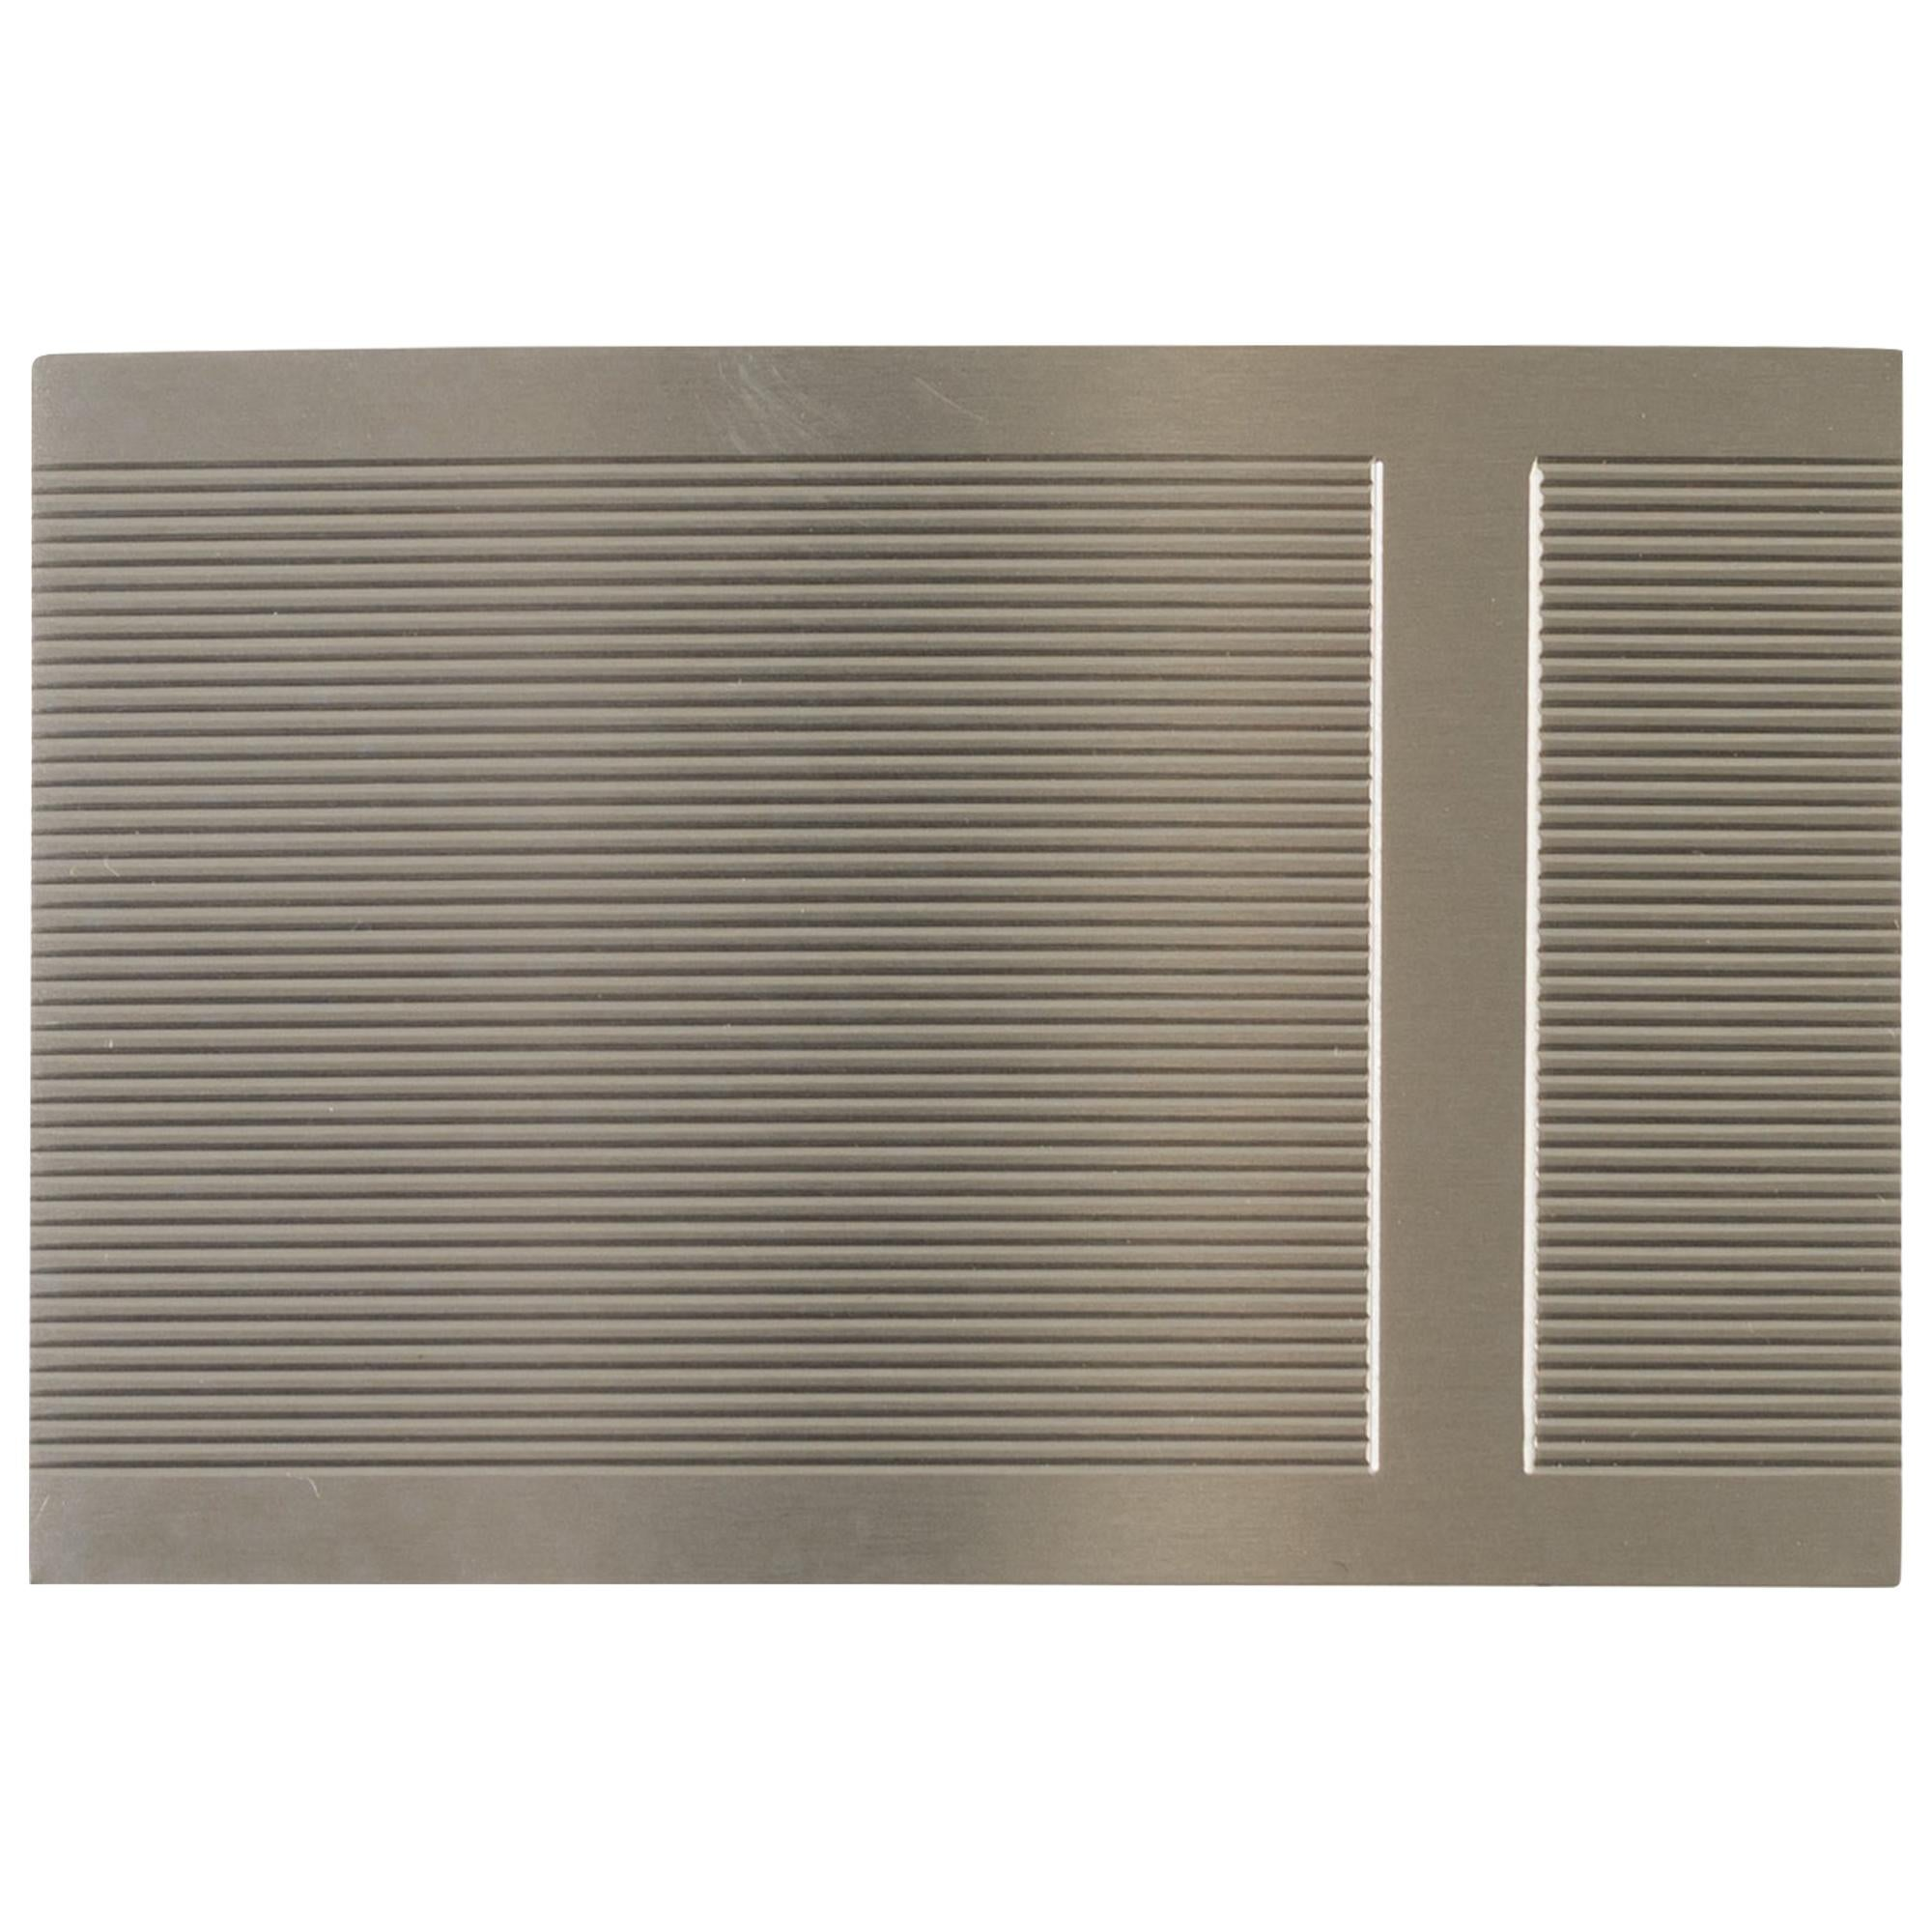 Brand New Hermes Rectangle Belt Buckle in Silver metal (37mm)